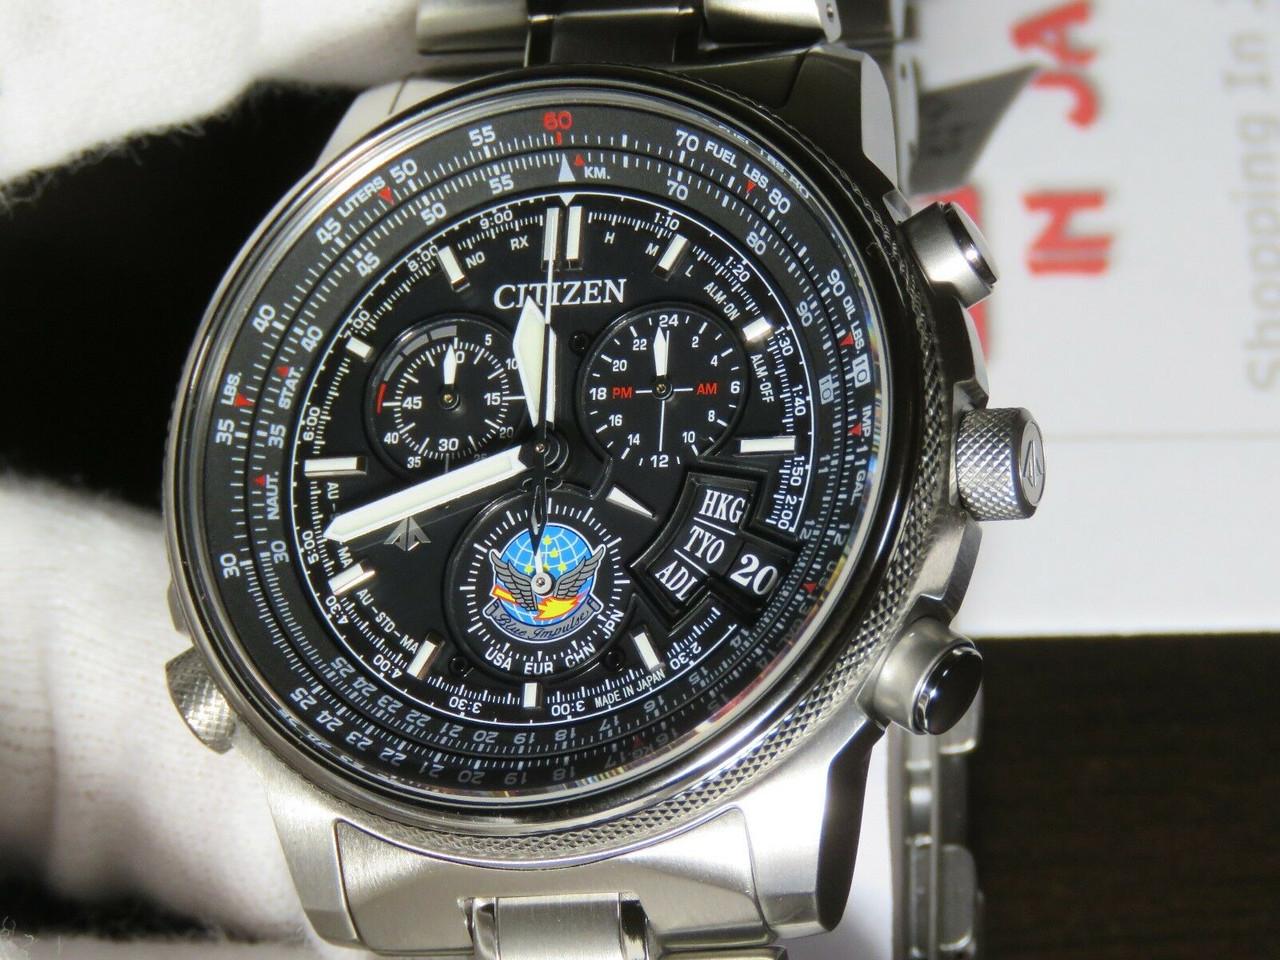 Citizen Promaster Sky BY0080-65E Blue Impulse Limited